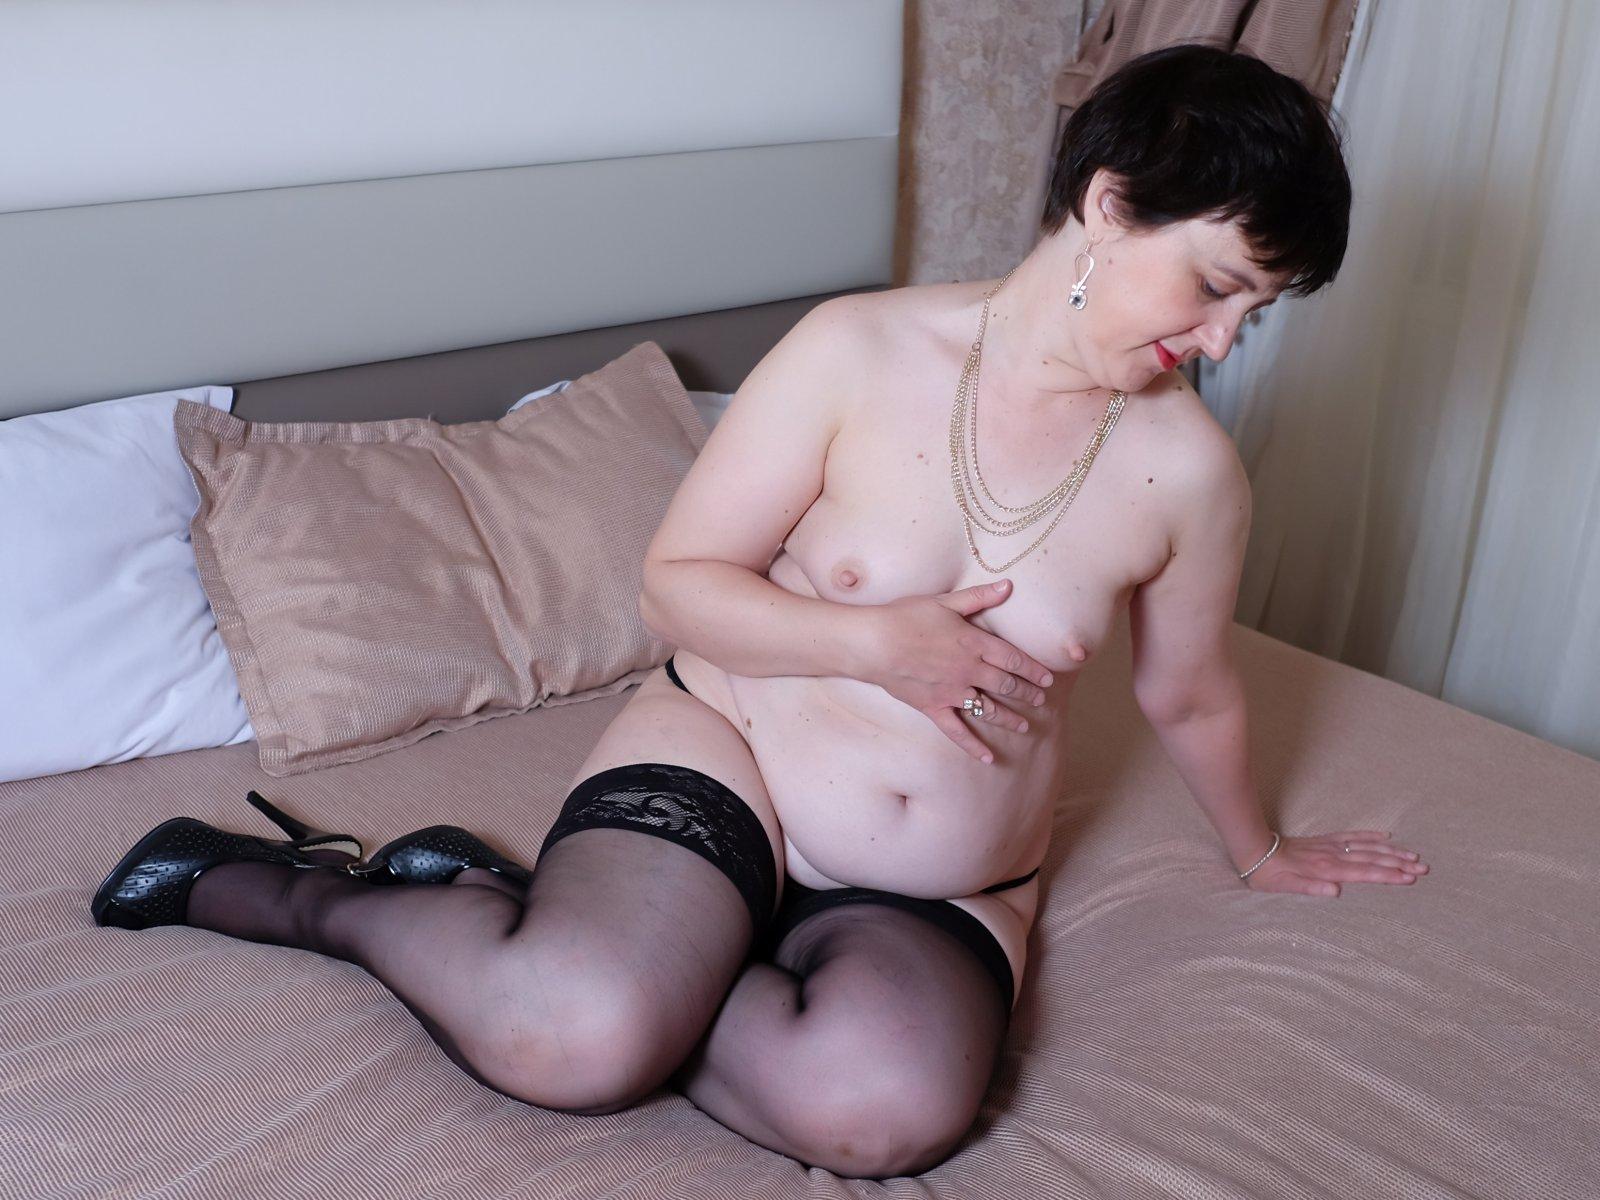 Amateur Big Tits Webcam And Asian Tits Webcam